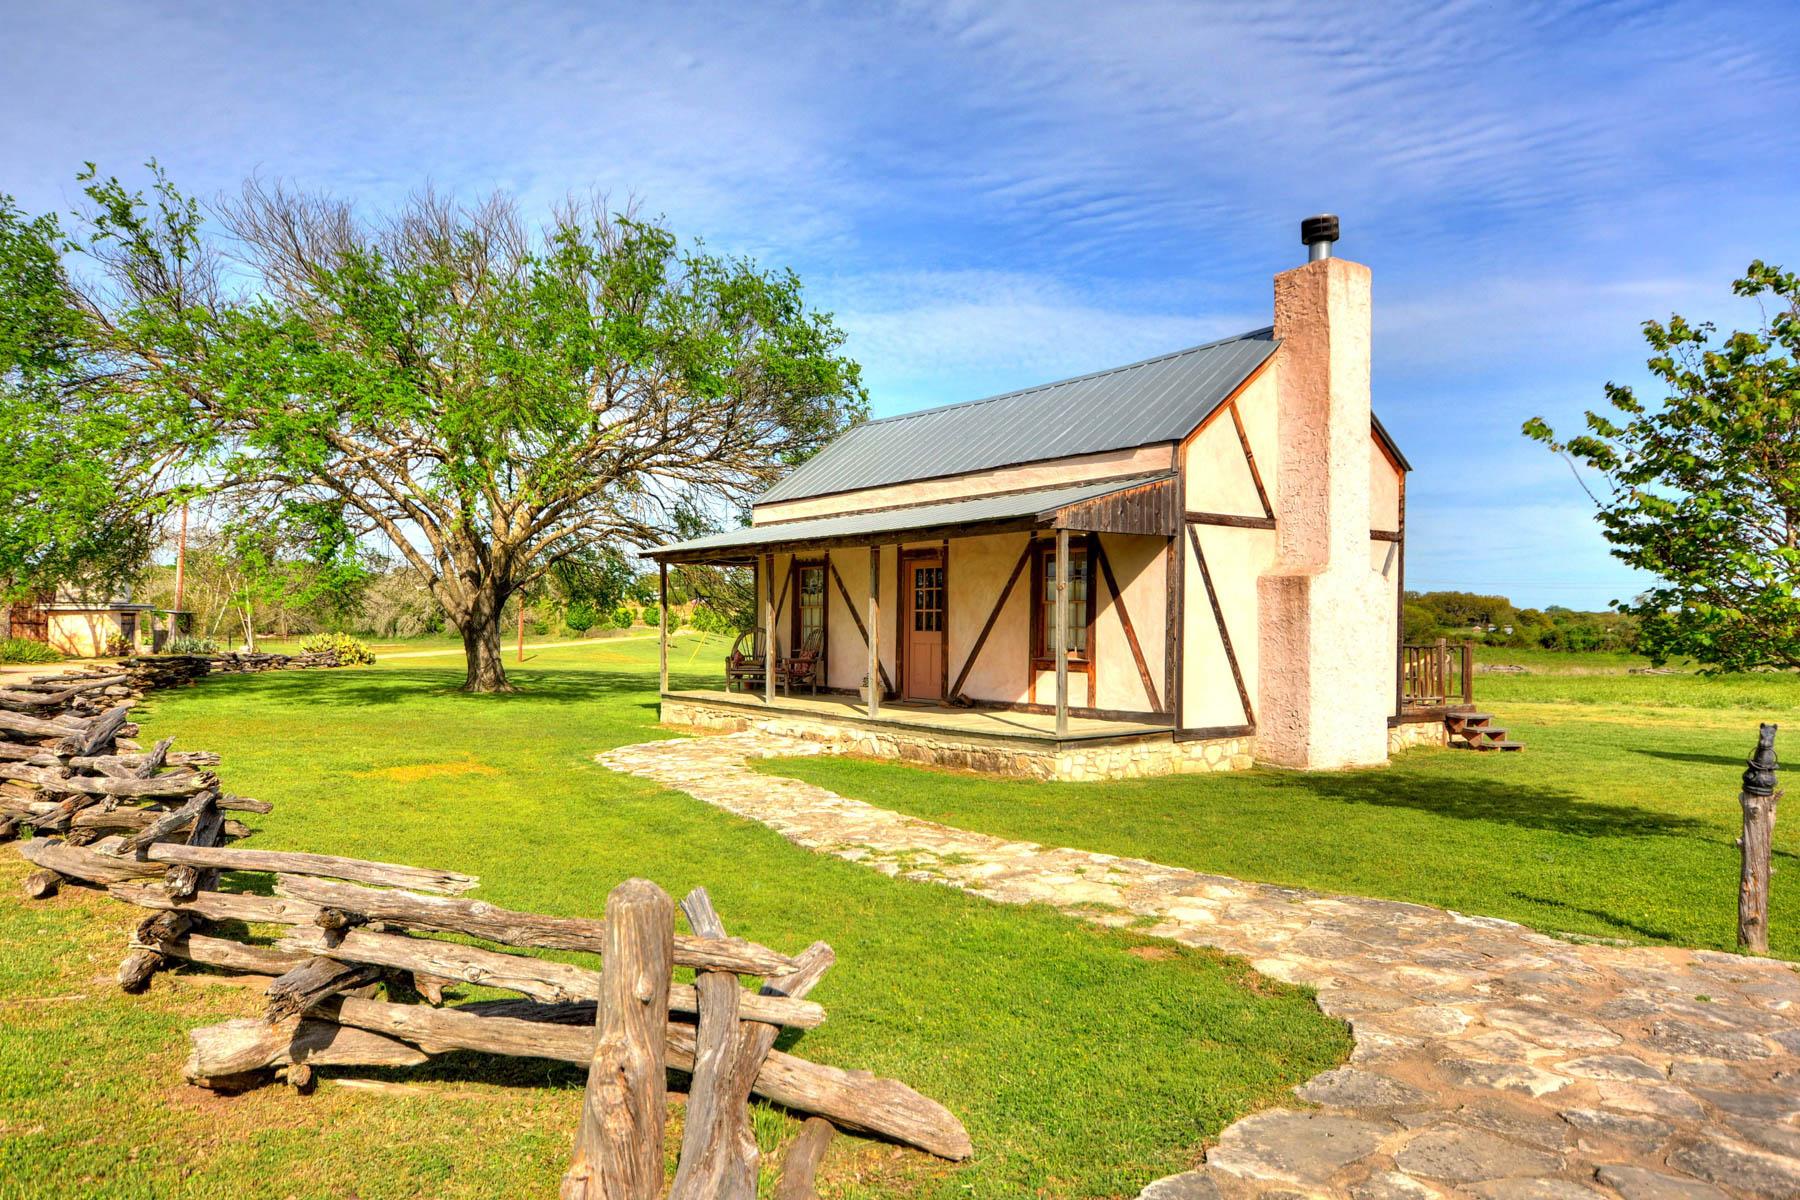 Additional photo for property listing at Amazing Fredericksburg Property on 36-/+ Acres 457 Bob Moritz Fredericksburg, Texas 78624 United States